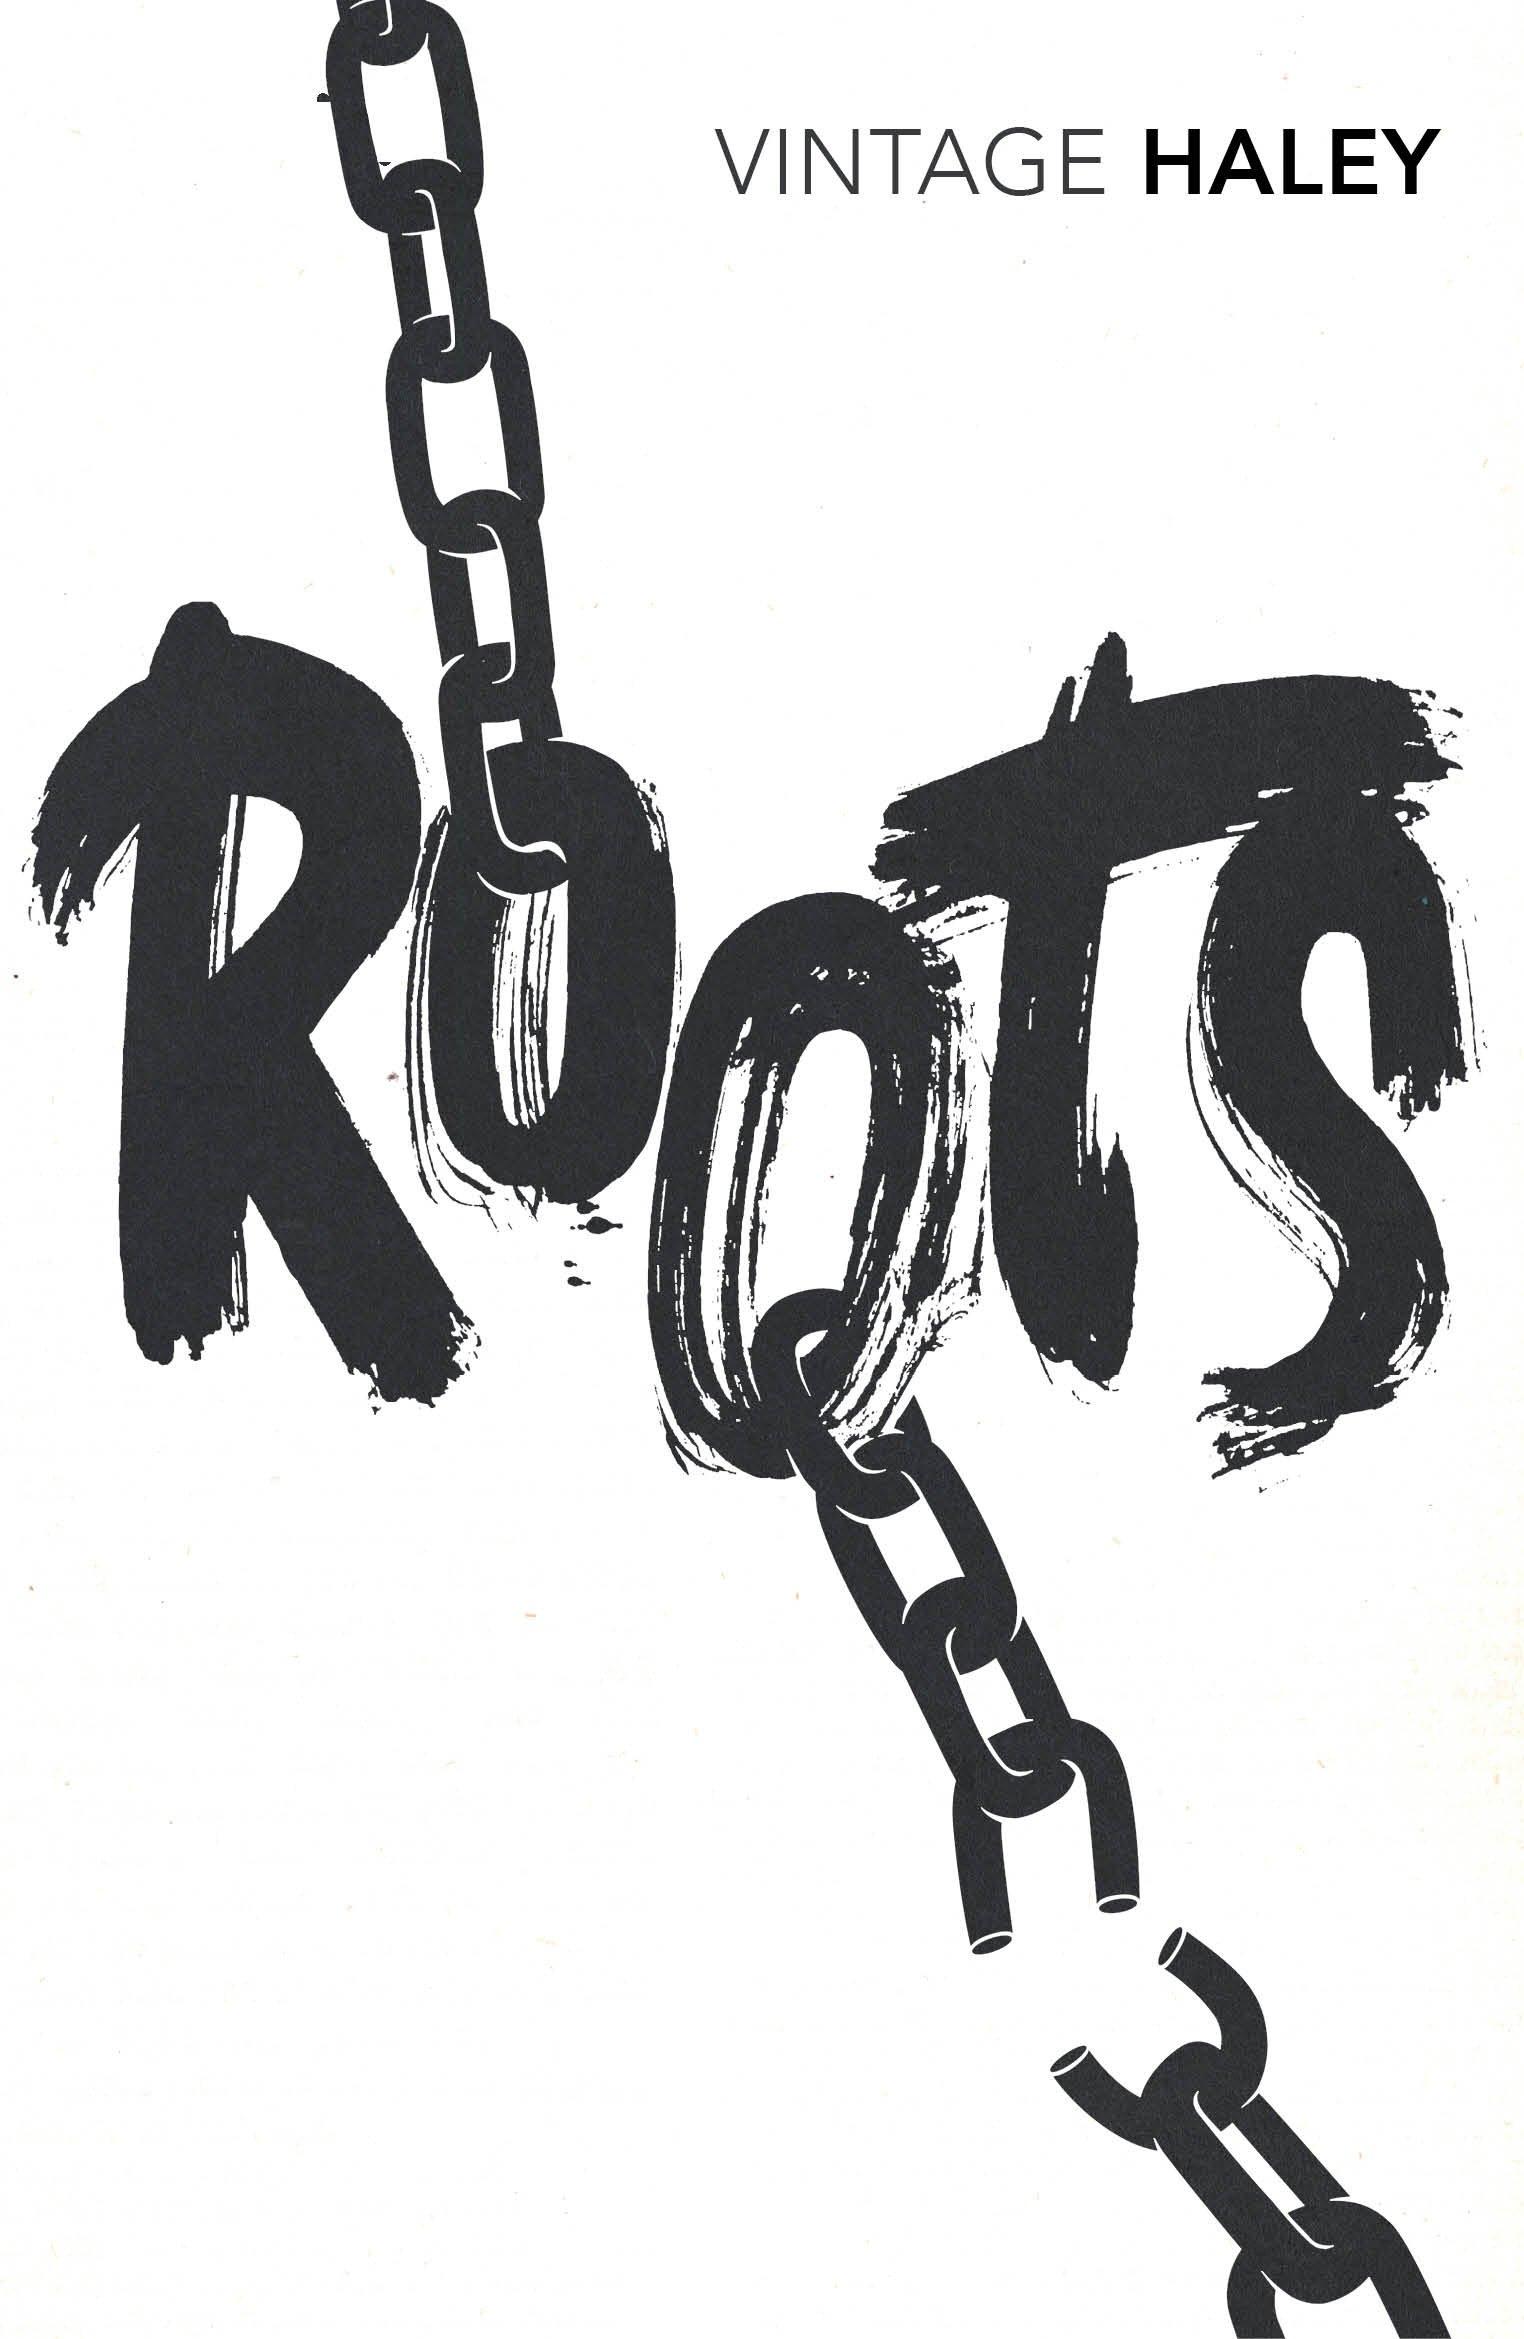 Roots  Amazon.co.uk  Alex Haley  9781784873387  Books f5893b24a2a84